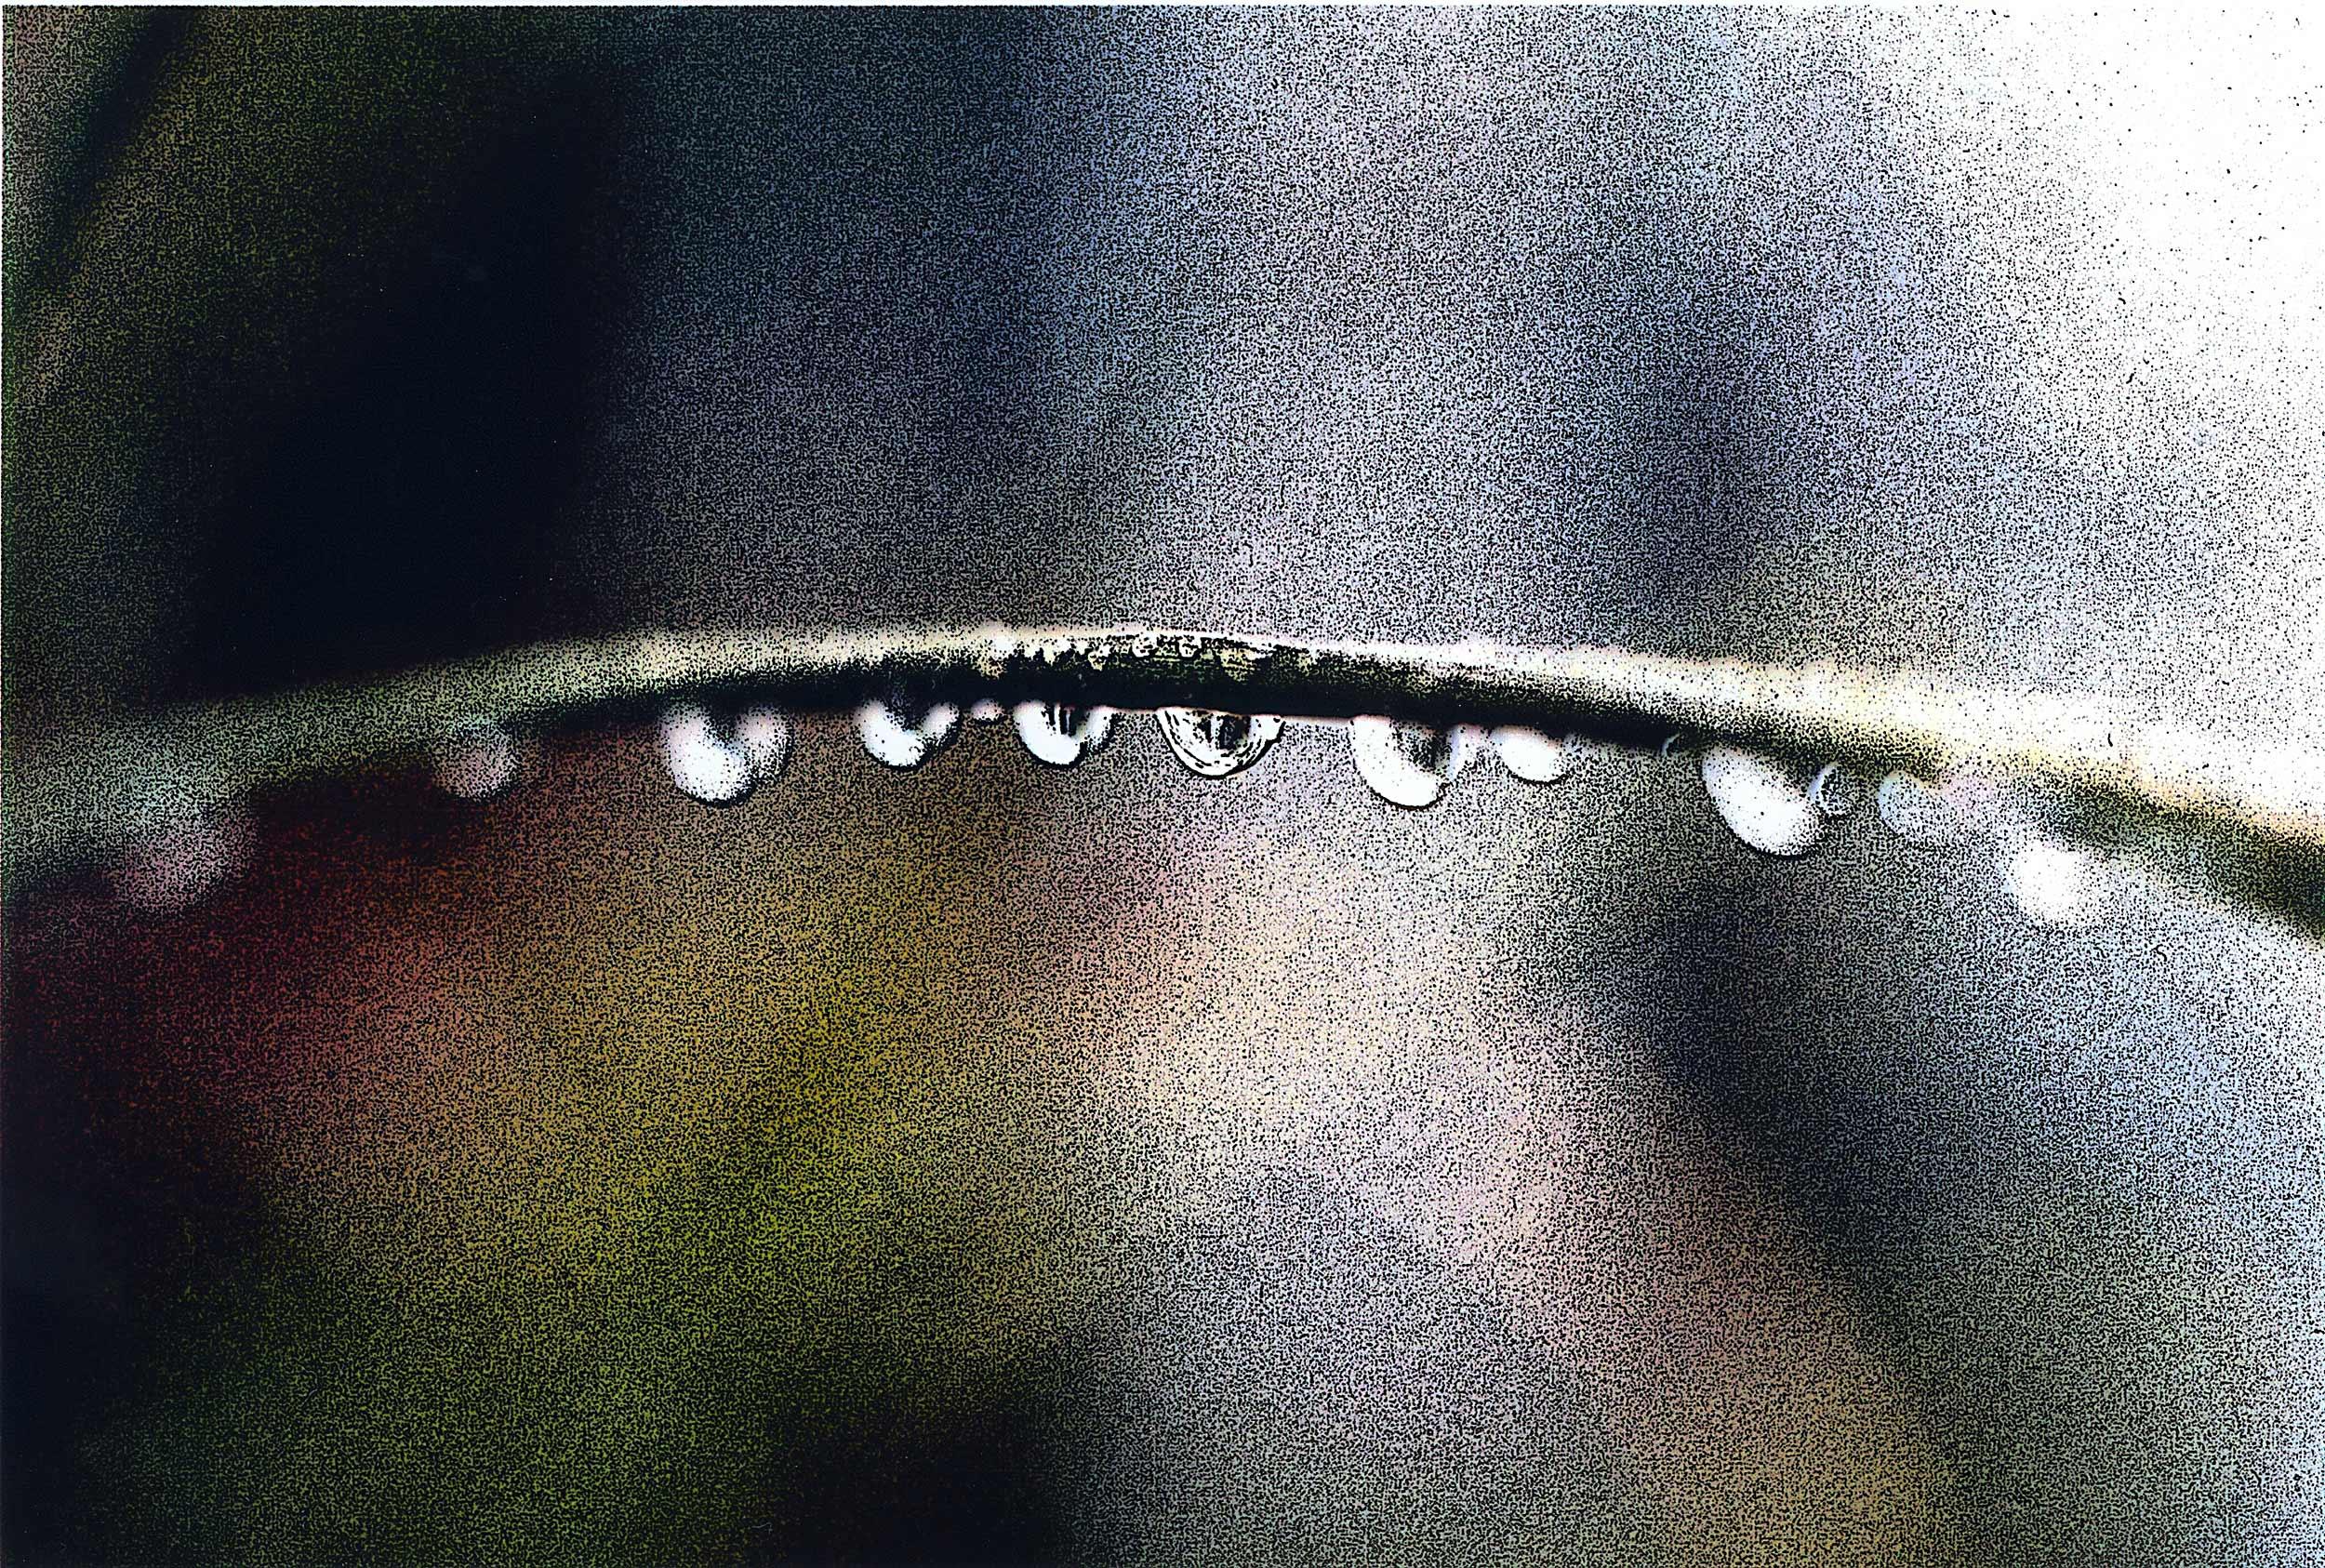 HUNTER_raindrop_necklace.jpg